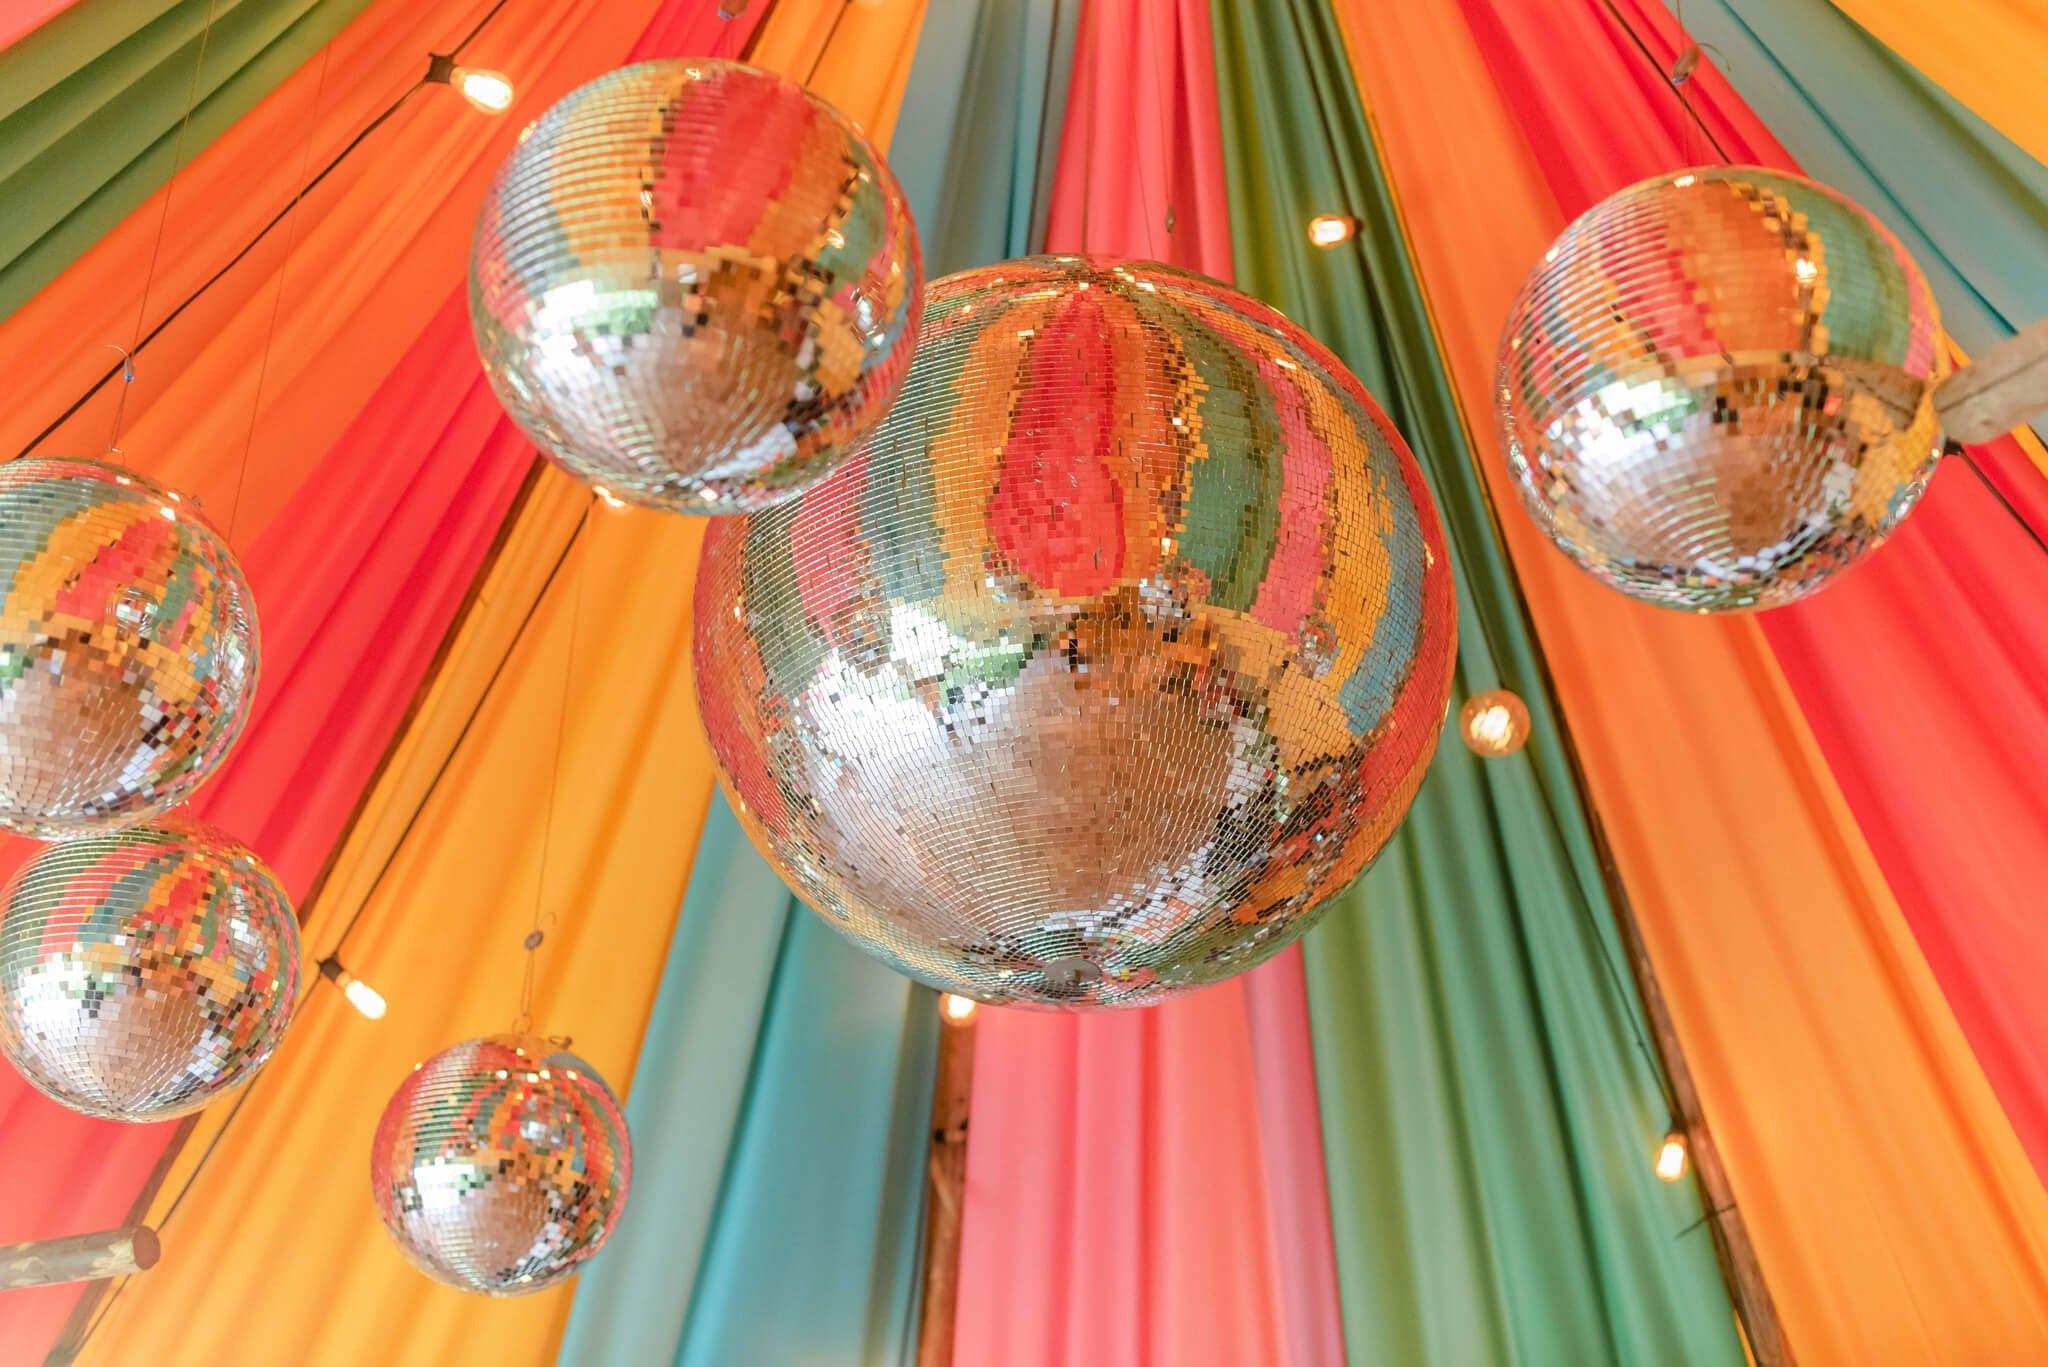 Disco balls daisy lillingston